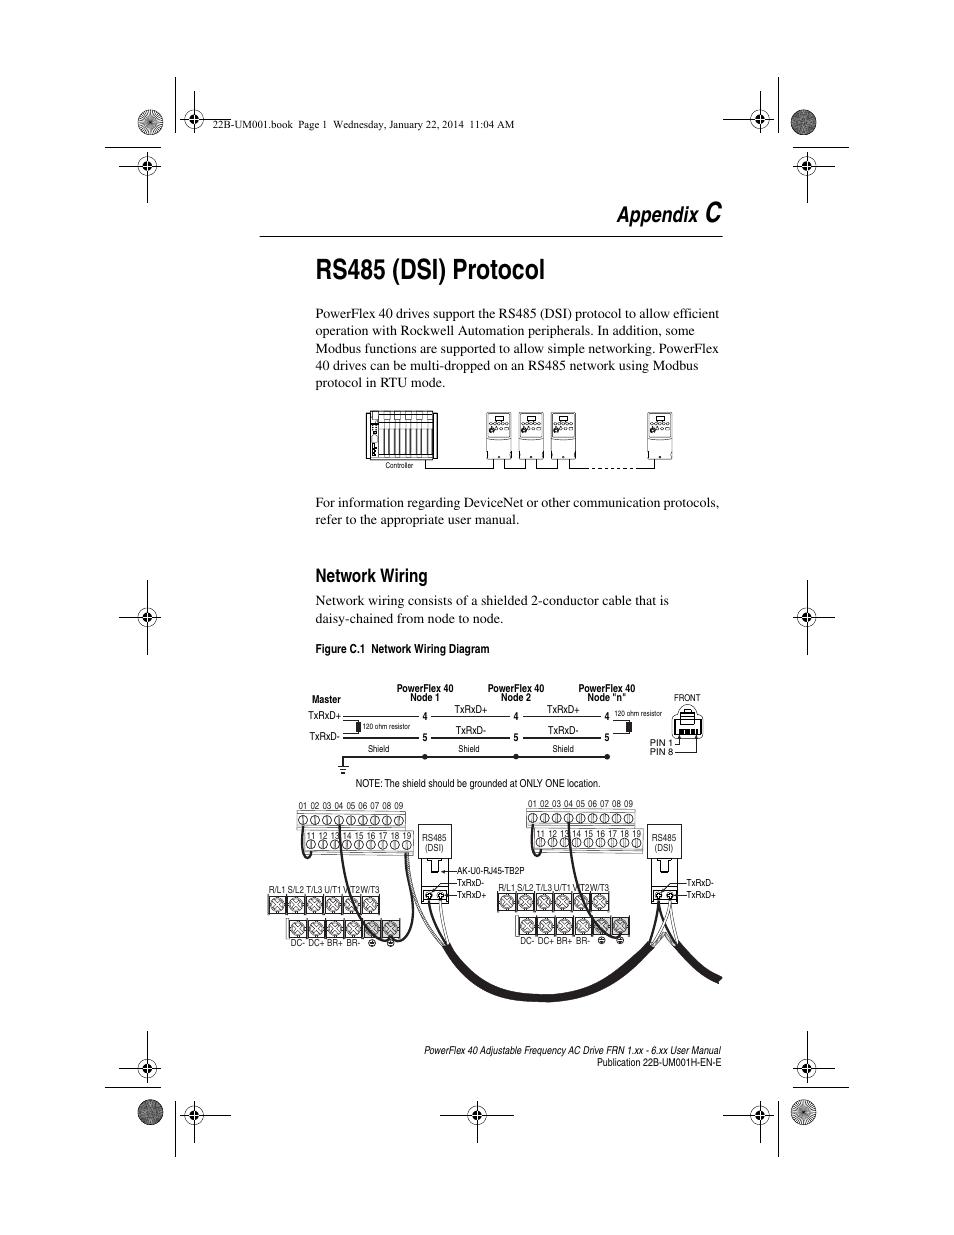 powerflex 70 wiring diagram series a powerflex 753 wiring